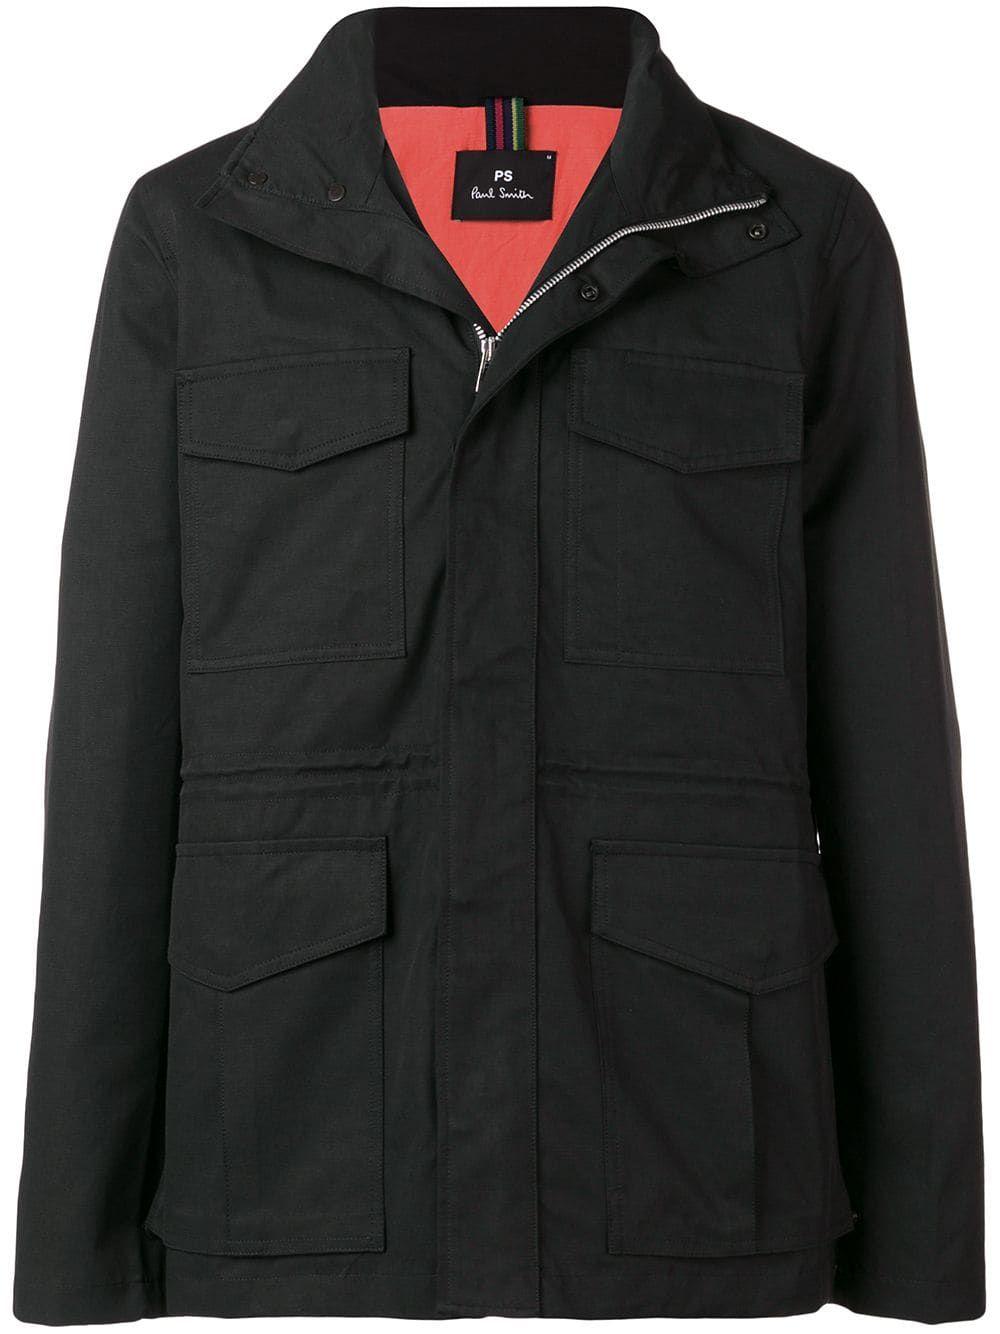 Paul Jacket Ps Black Smith Pocket Flap By 5nn10zg